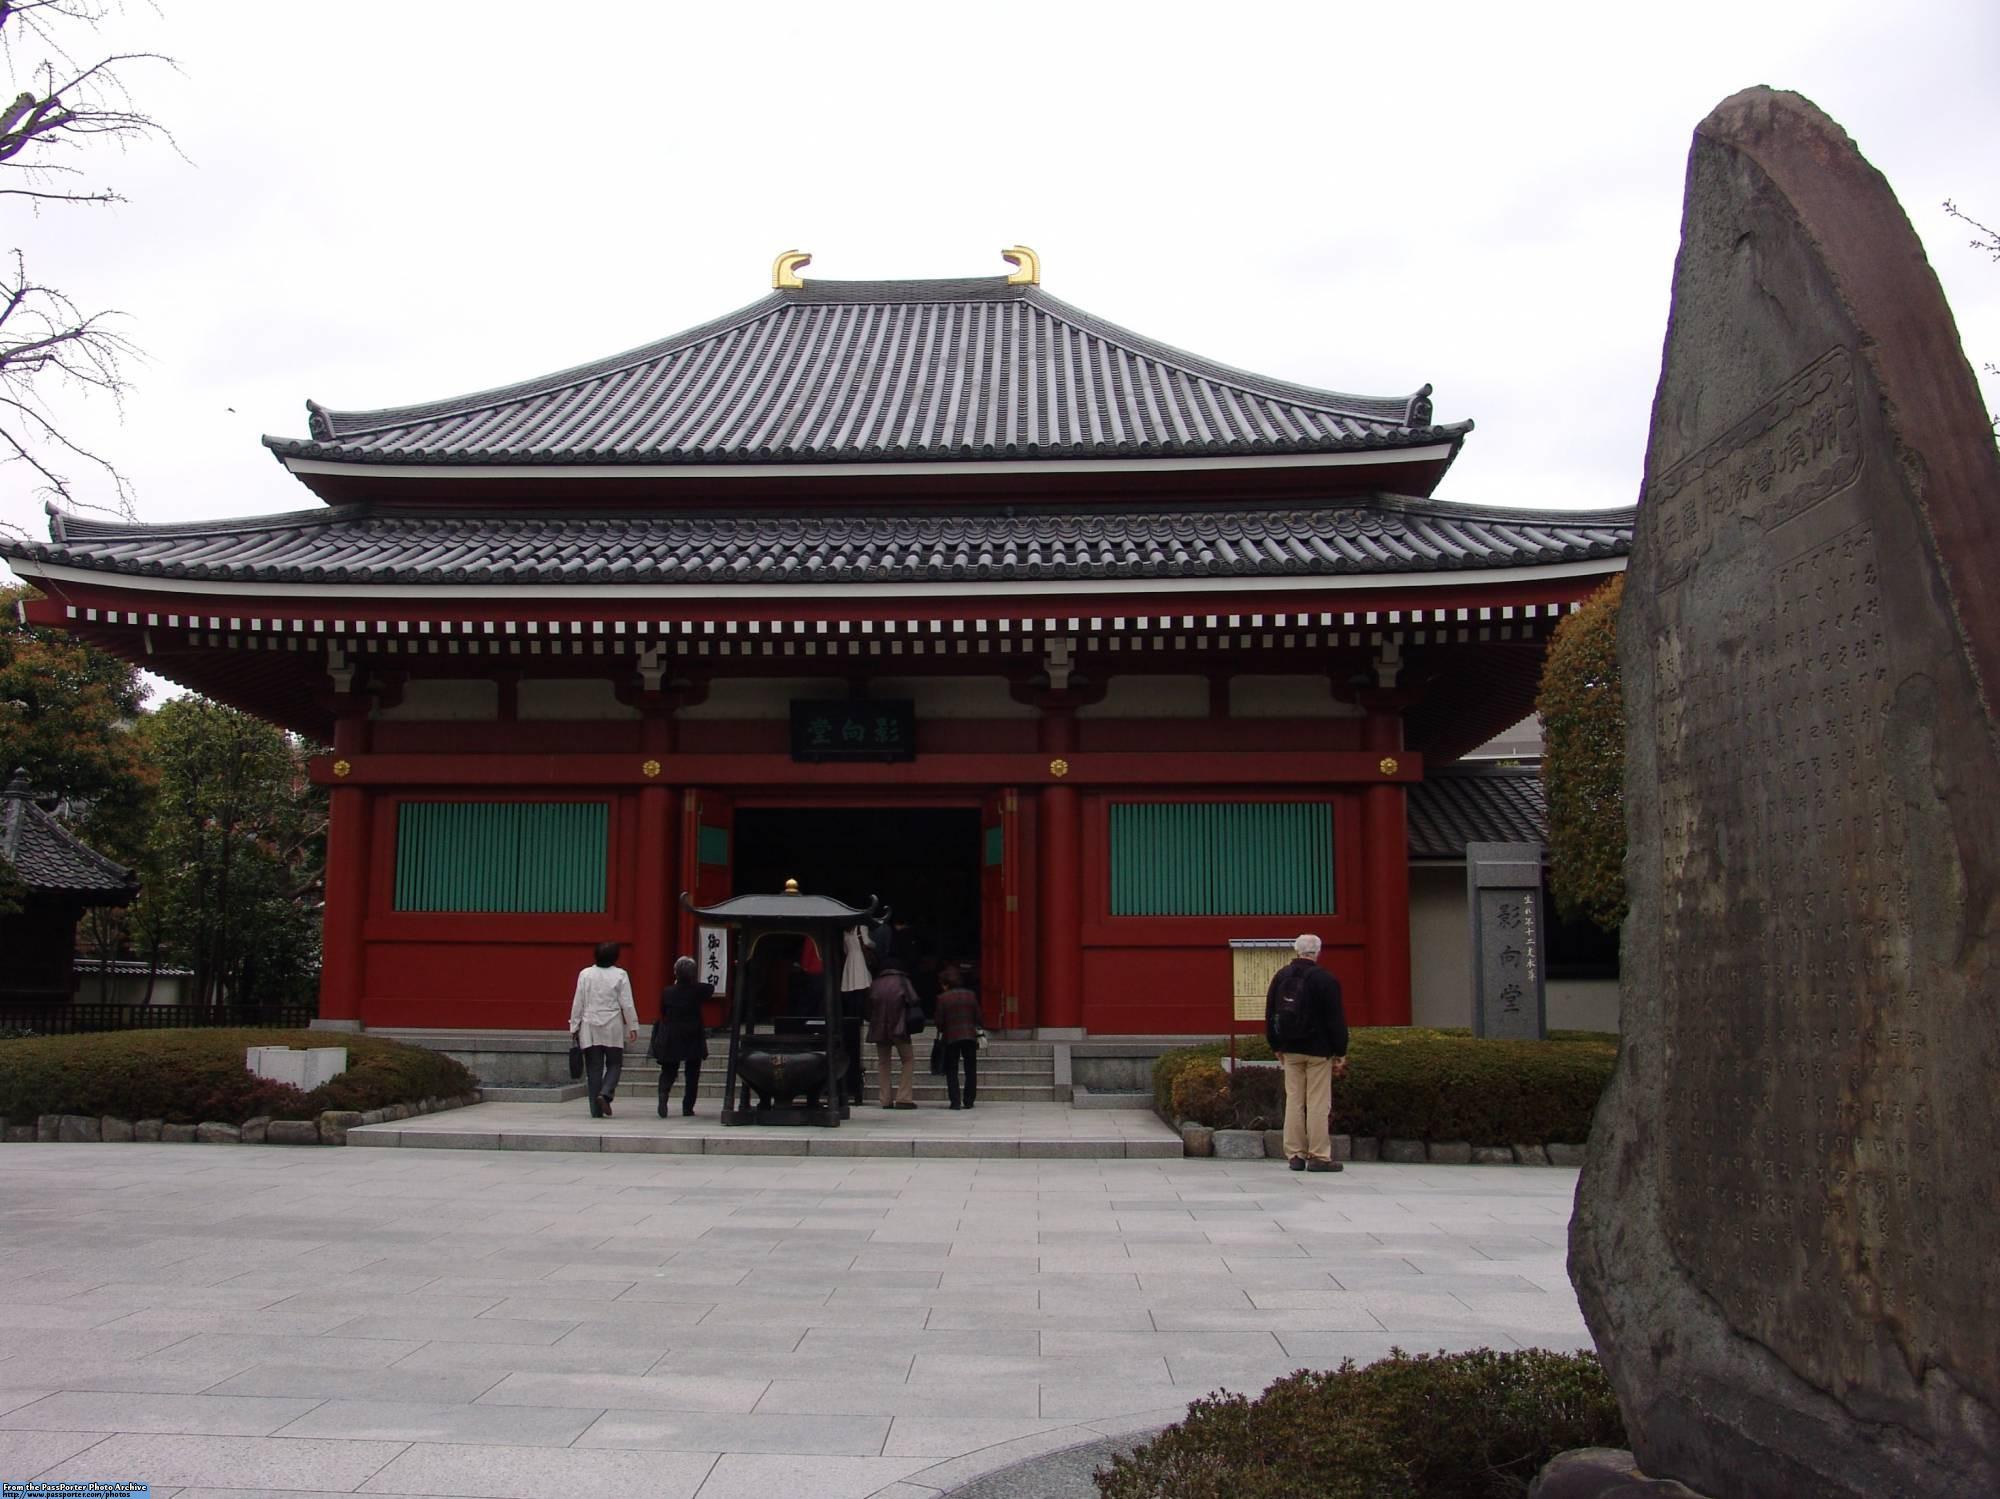 Explore Tokyo while visiting the Tokyo Disney Resort |PassPorter.com